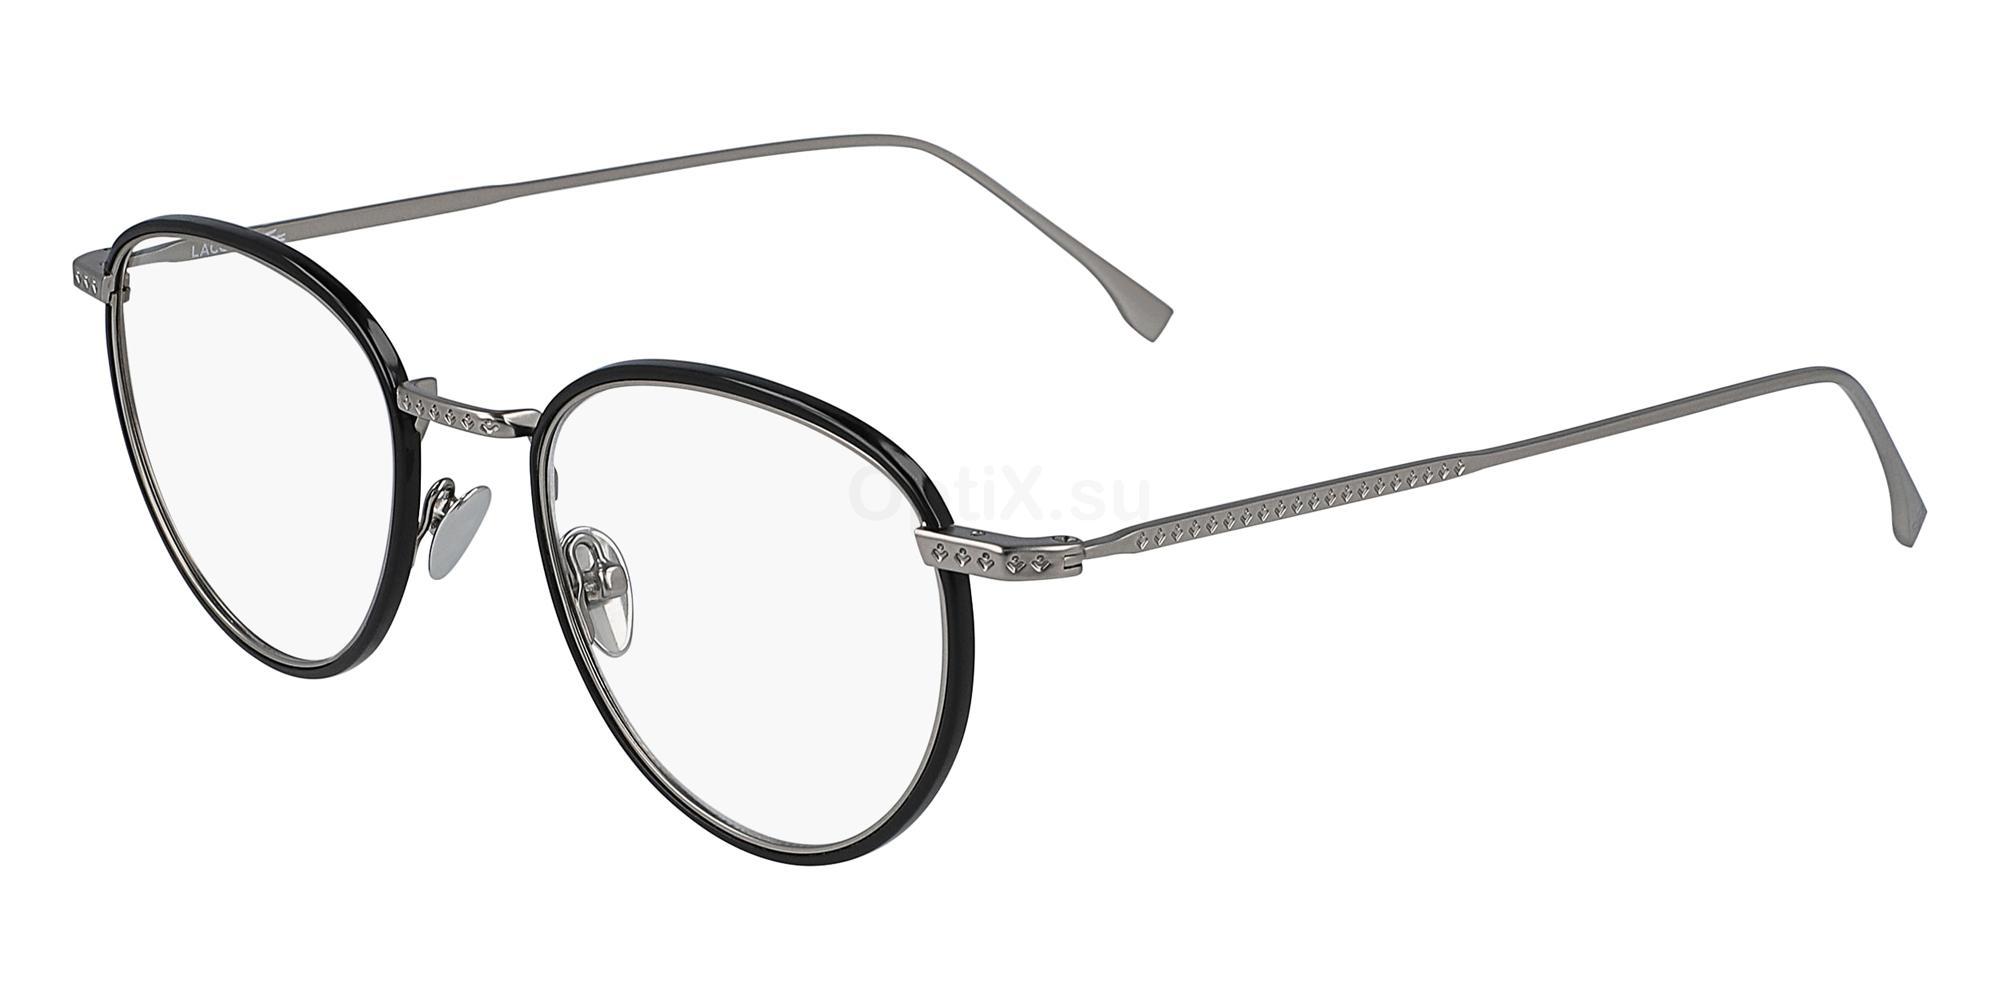 001 L2602ND Glasses, Lacoste